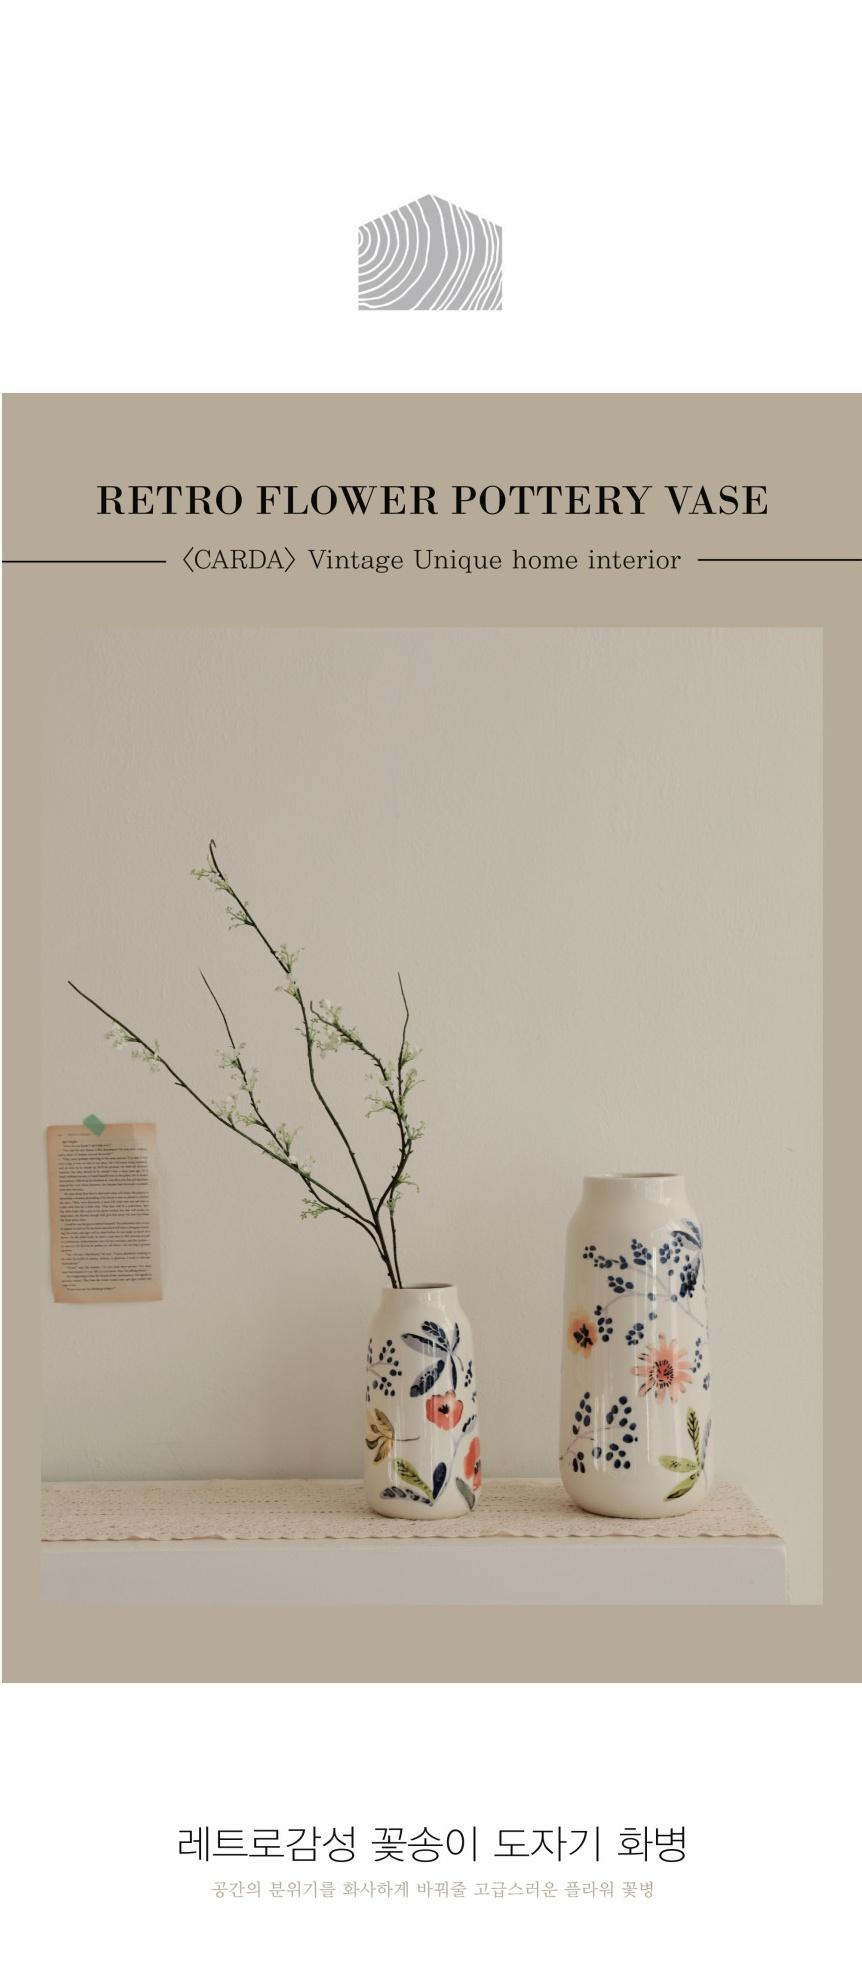 retro_flowerpattern_pottery_vase_01.jpg